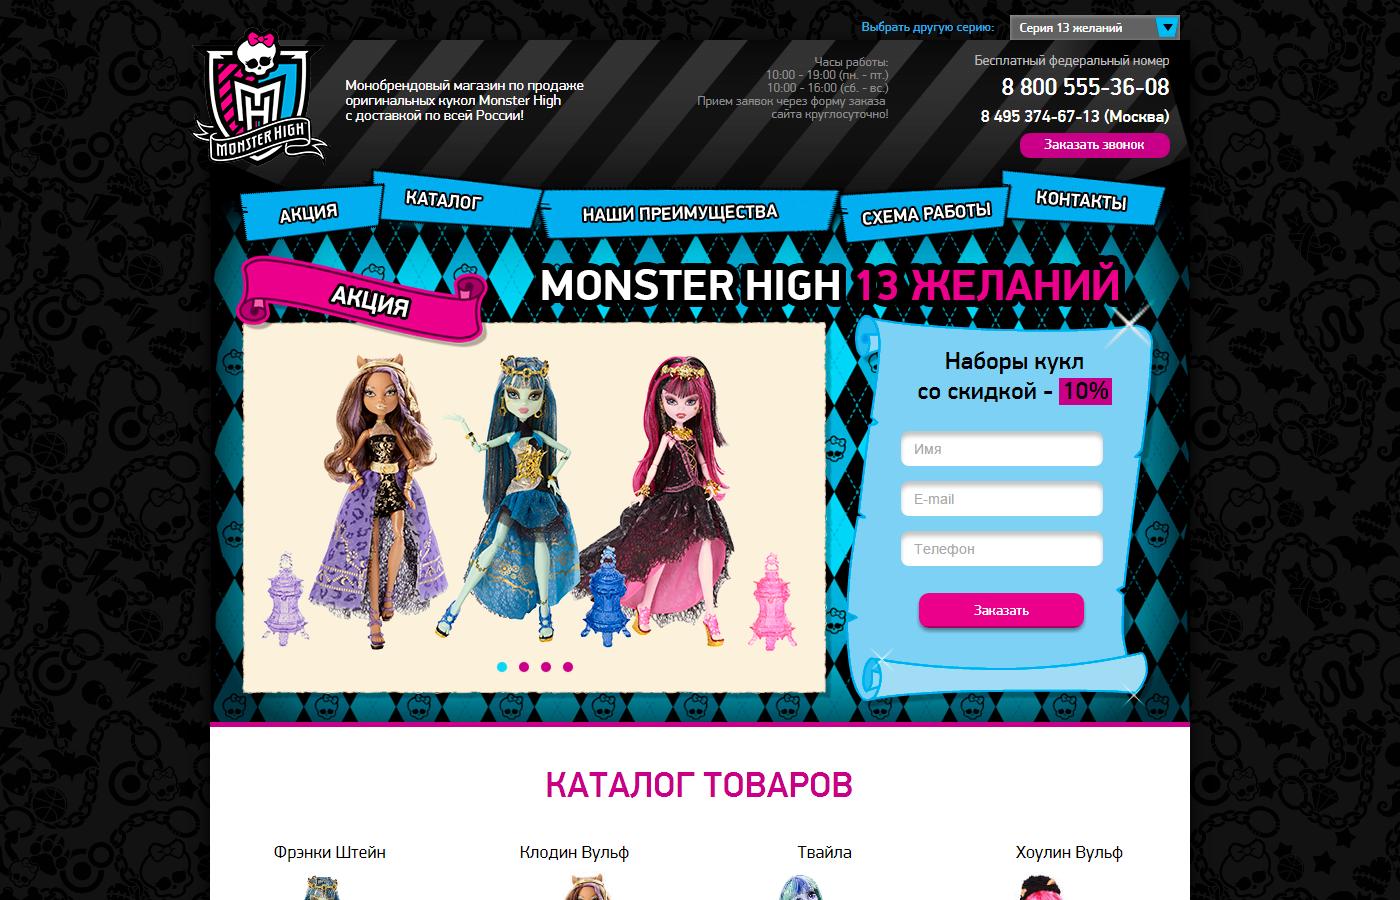 2014 - Landing Page оригинальных кукол Monster High